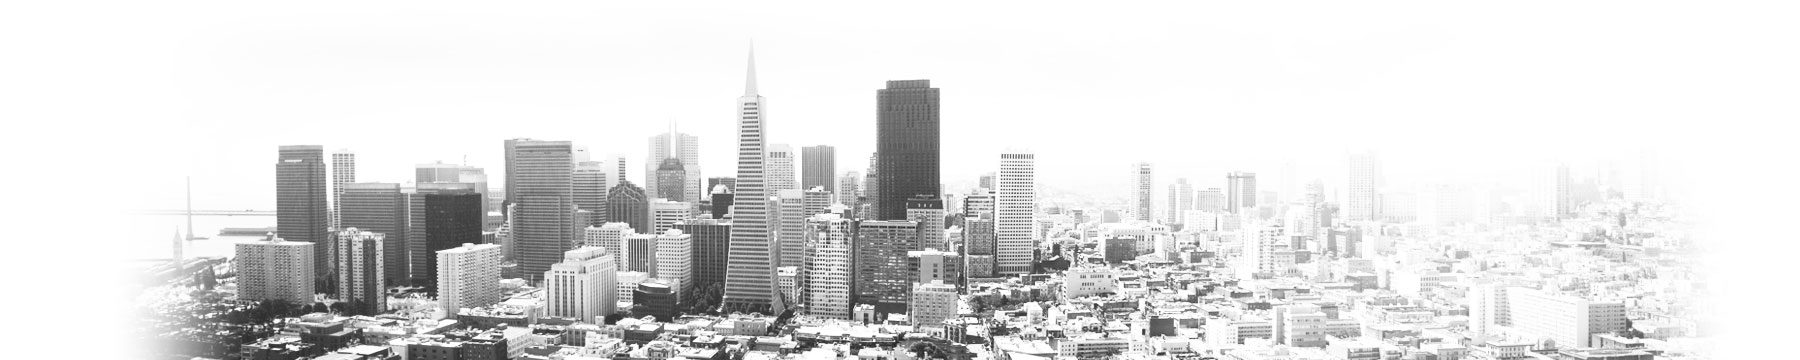 San Francisco skyline image